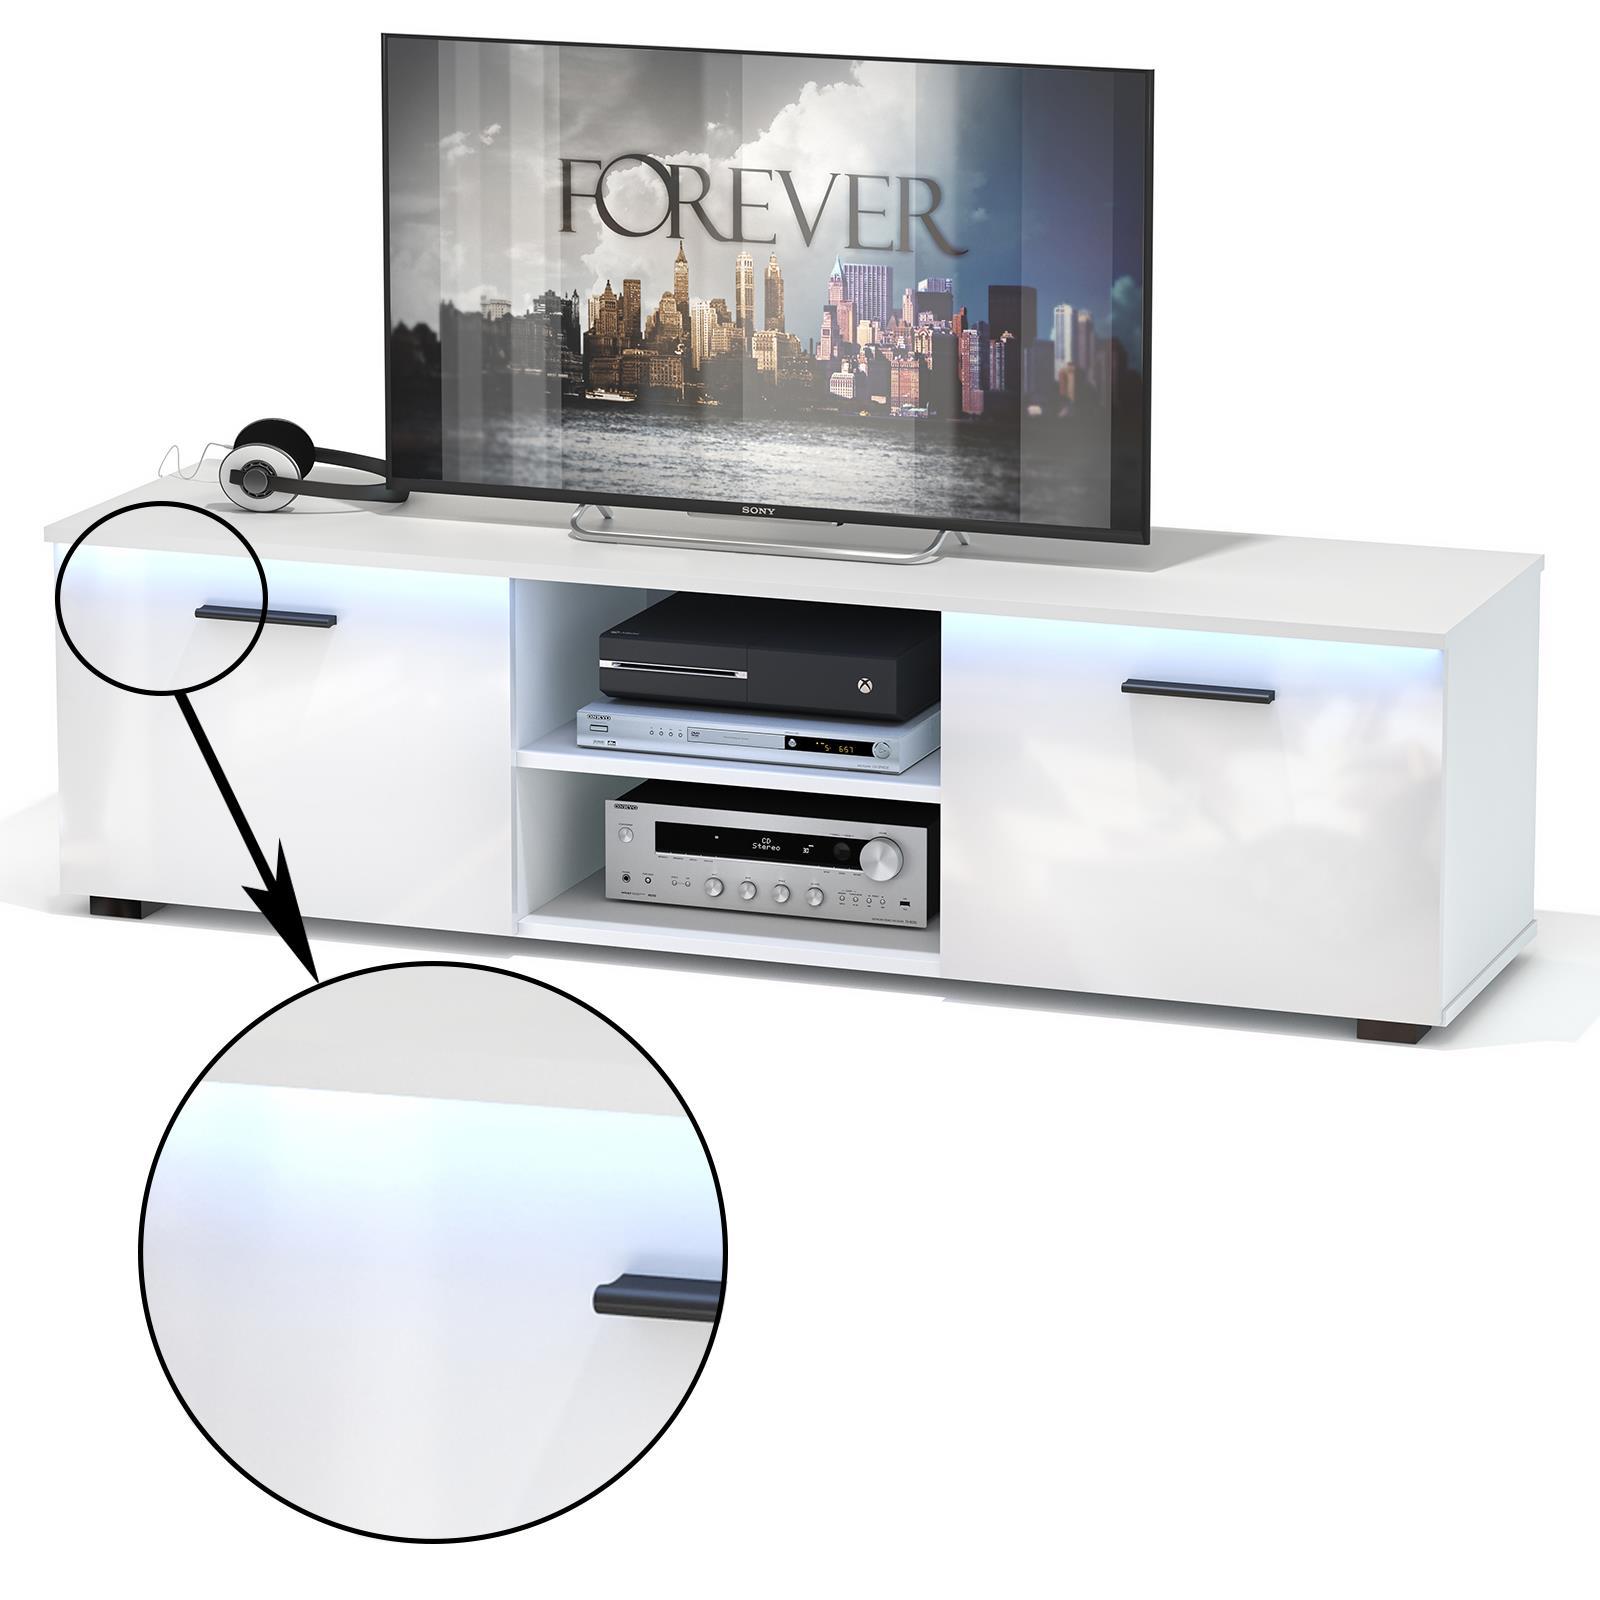 TV-Lowboard MALIBU, weiß Hochglanz mit LED Beleuchtung | CARO-Möbel